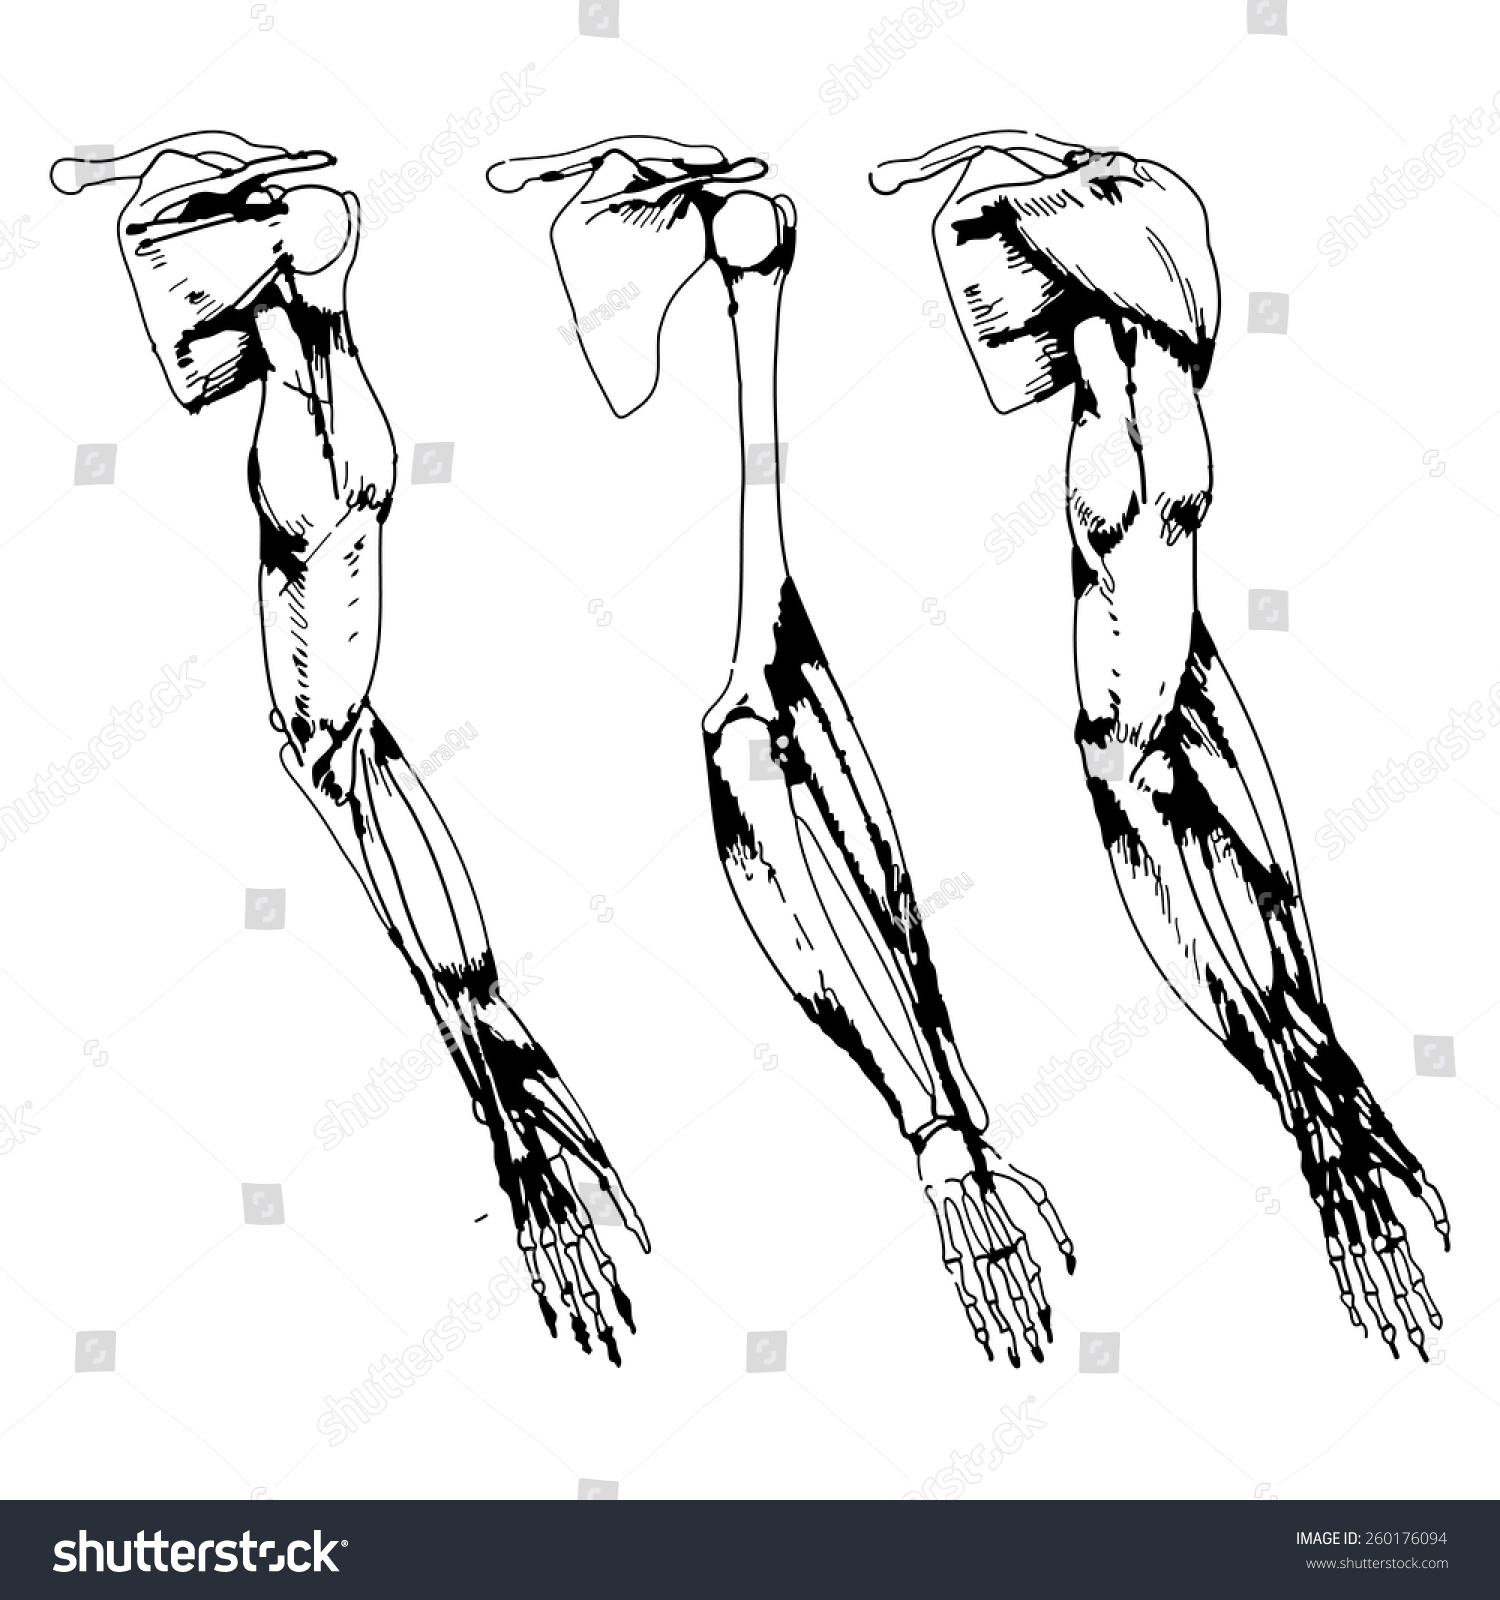 Arm Bones Muscle Vector Illustration Parts Stock Vector 260176094 ...